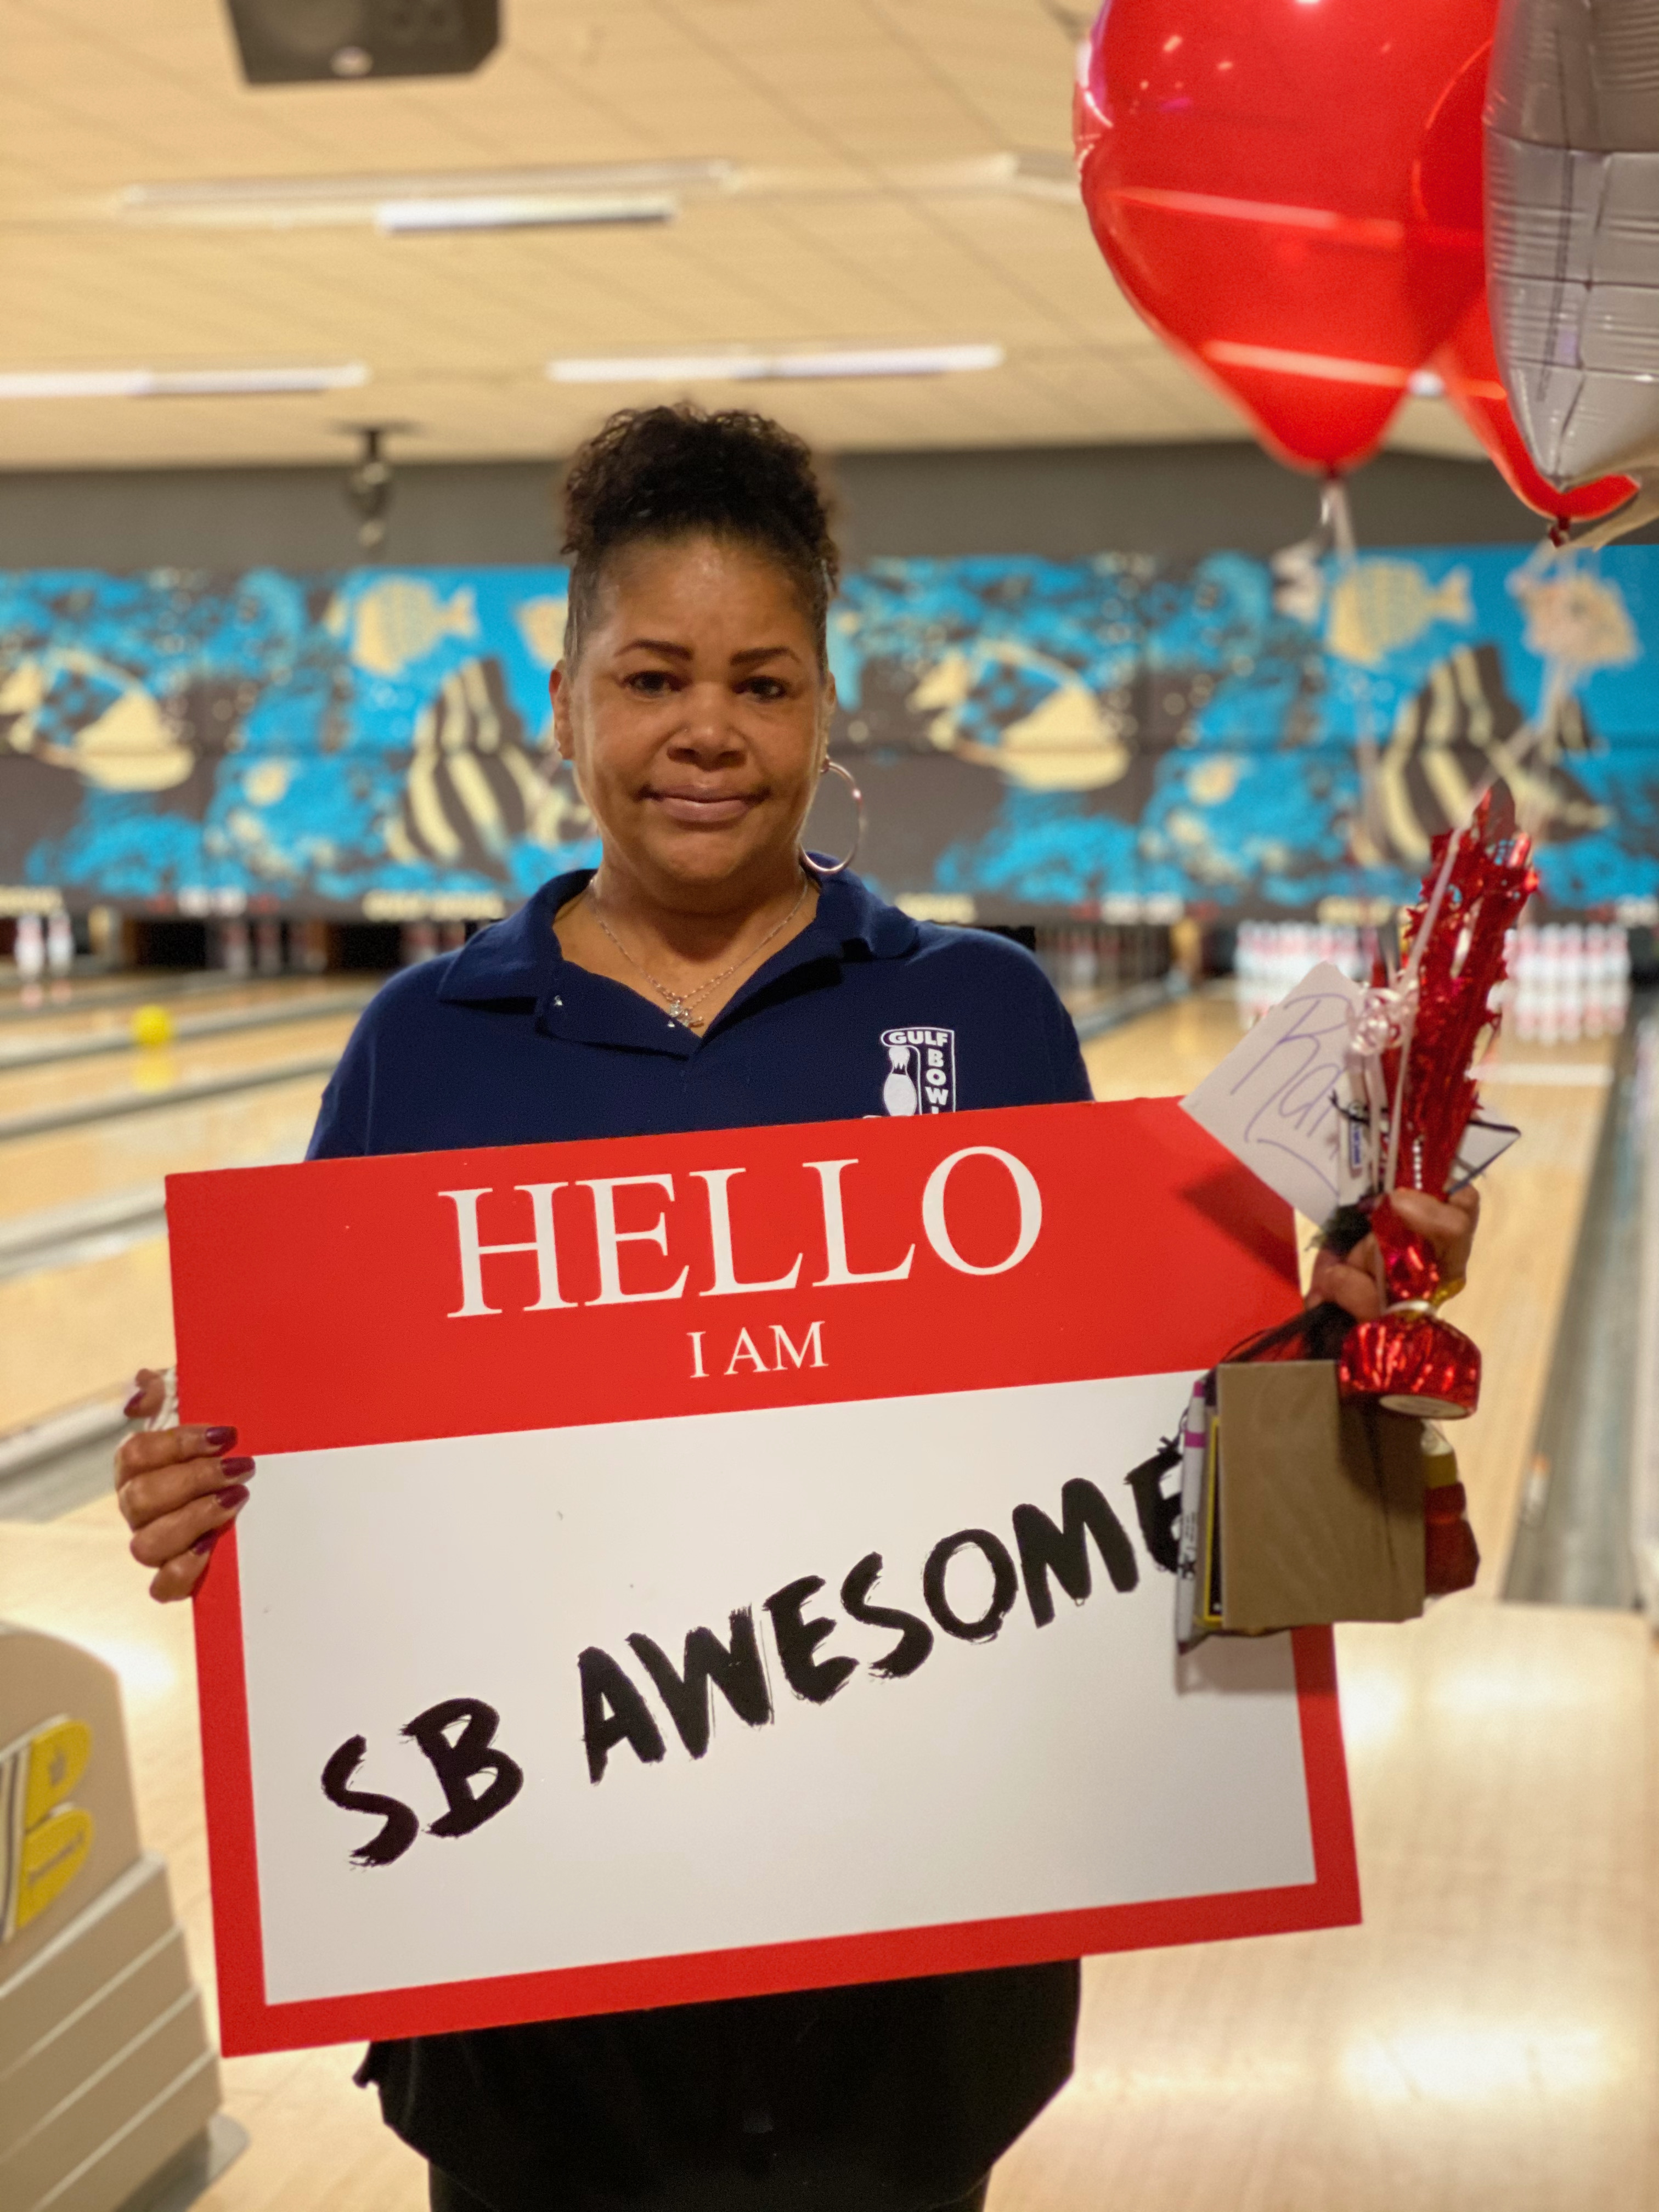 SBAwesome Winner - Ramona Brown